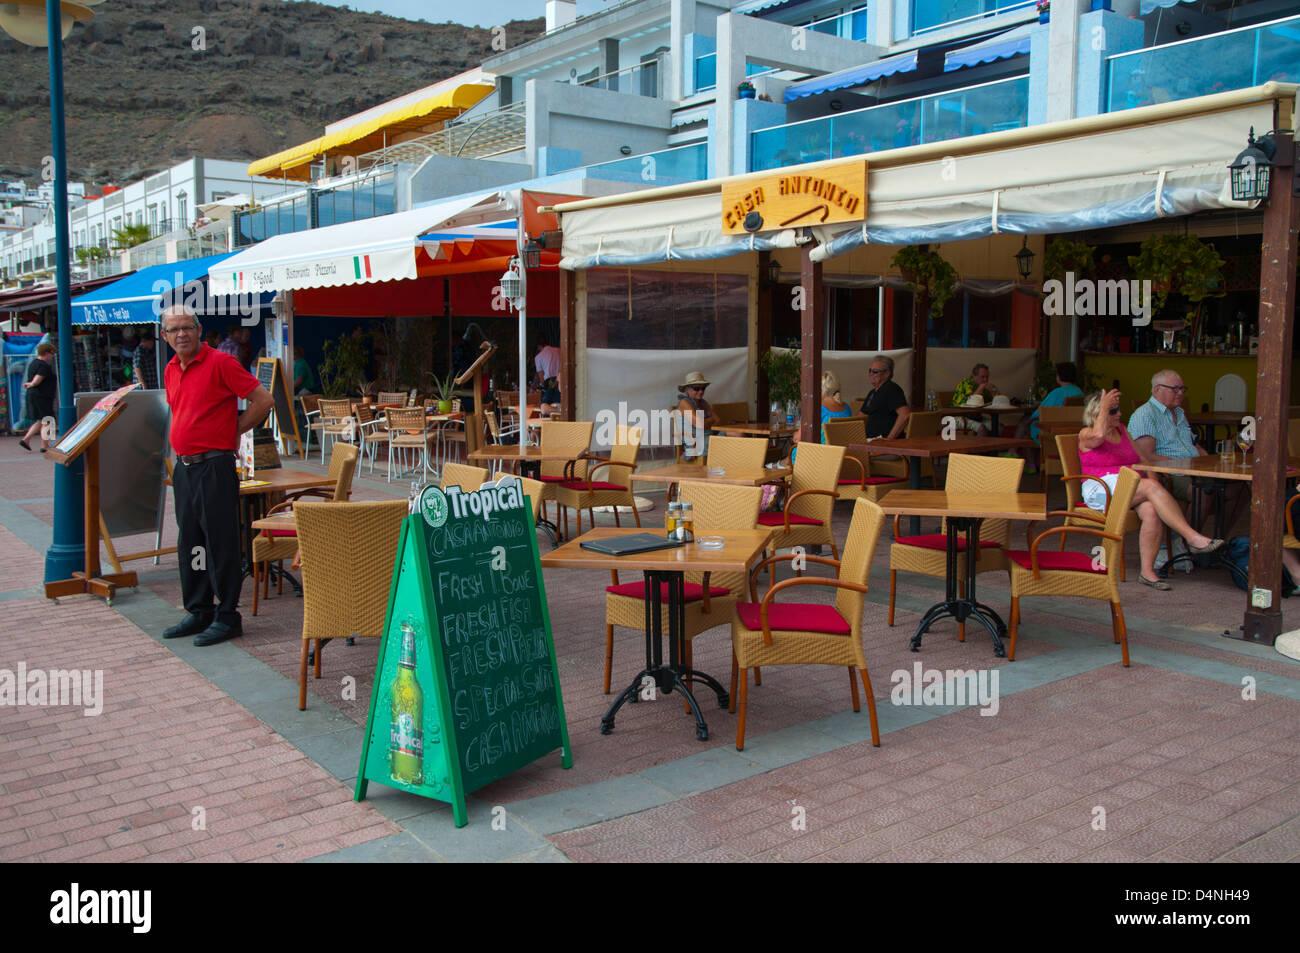 Bar-Café-Terrasse an der Strandpromenade Puerto de Mogan Resort Gran Canaria Insel der Kanarischen Inseln-Spanien Stockbild